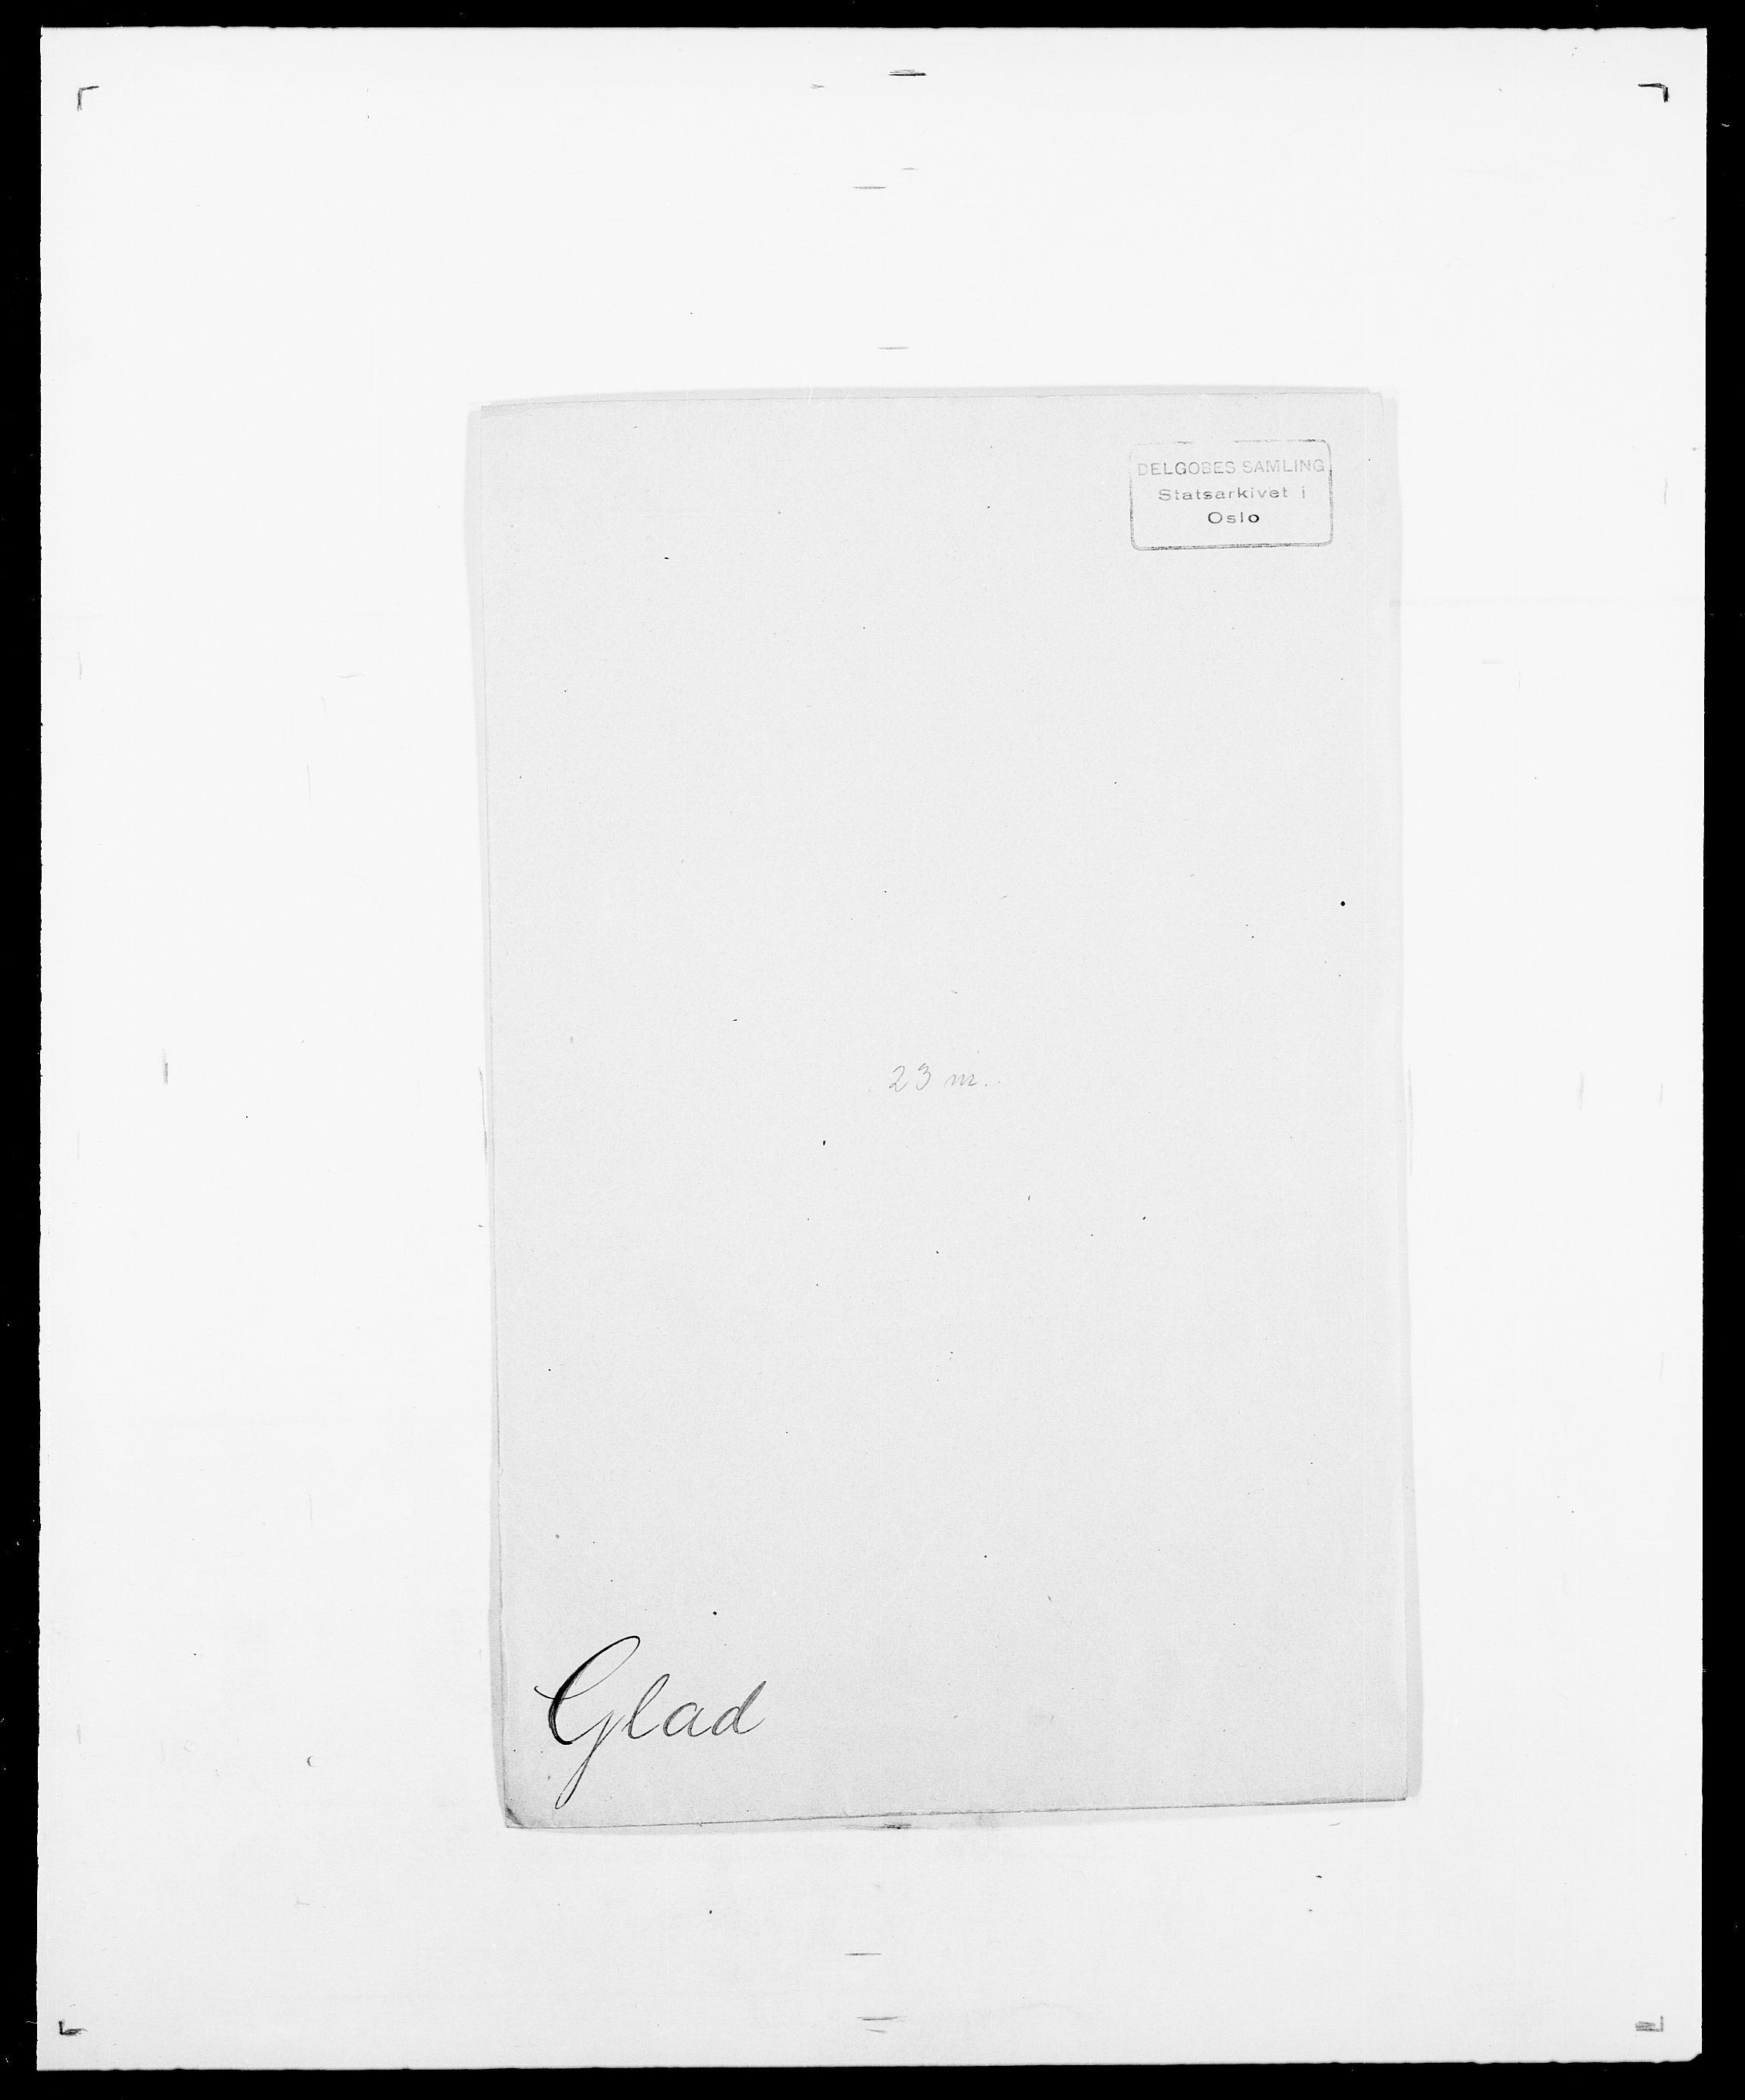 SAO, Delgobe, Charles Antoine - samling, D/Da/L0014: Giebdhausen - Grip, s. 234